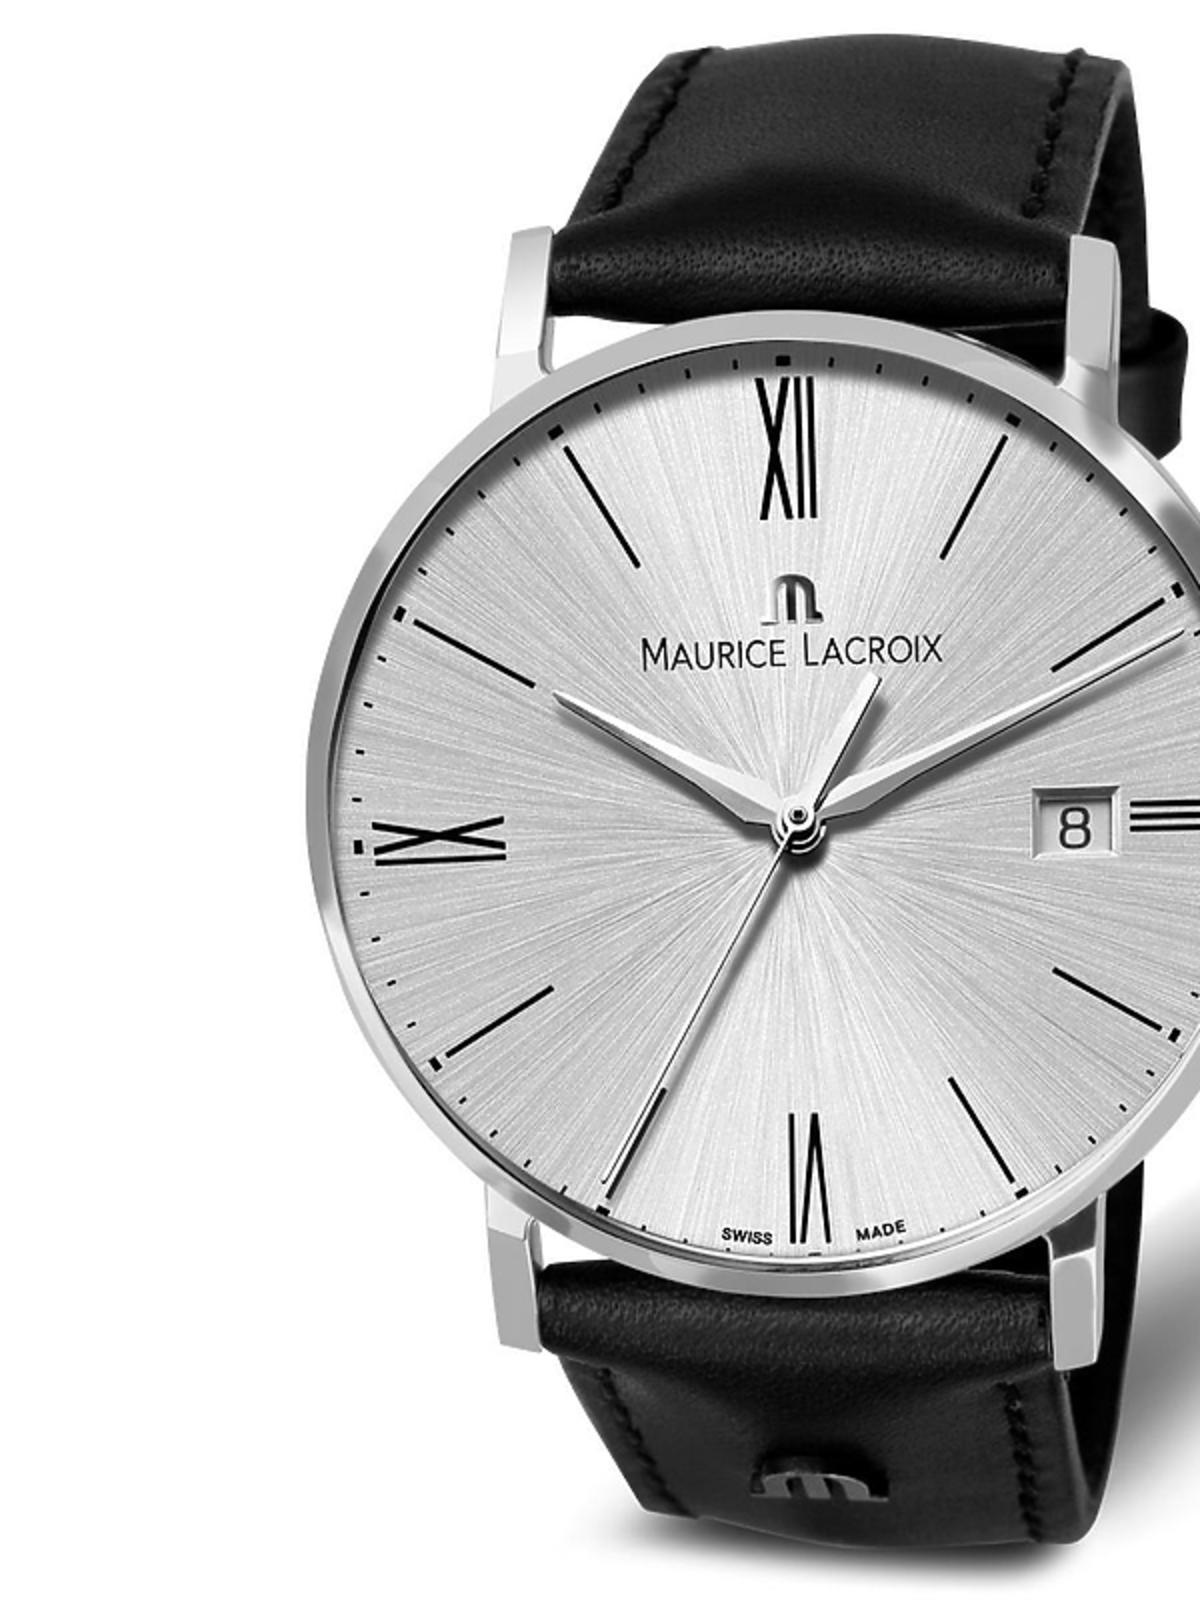 Zegarek, Maurice Lacroix, 2690,00 zł